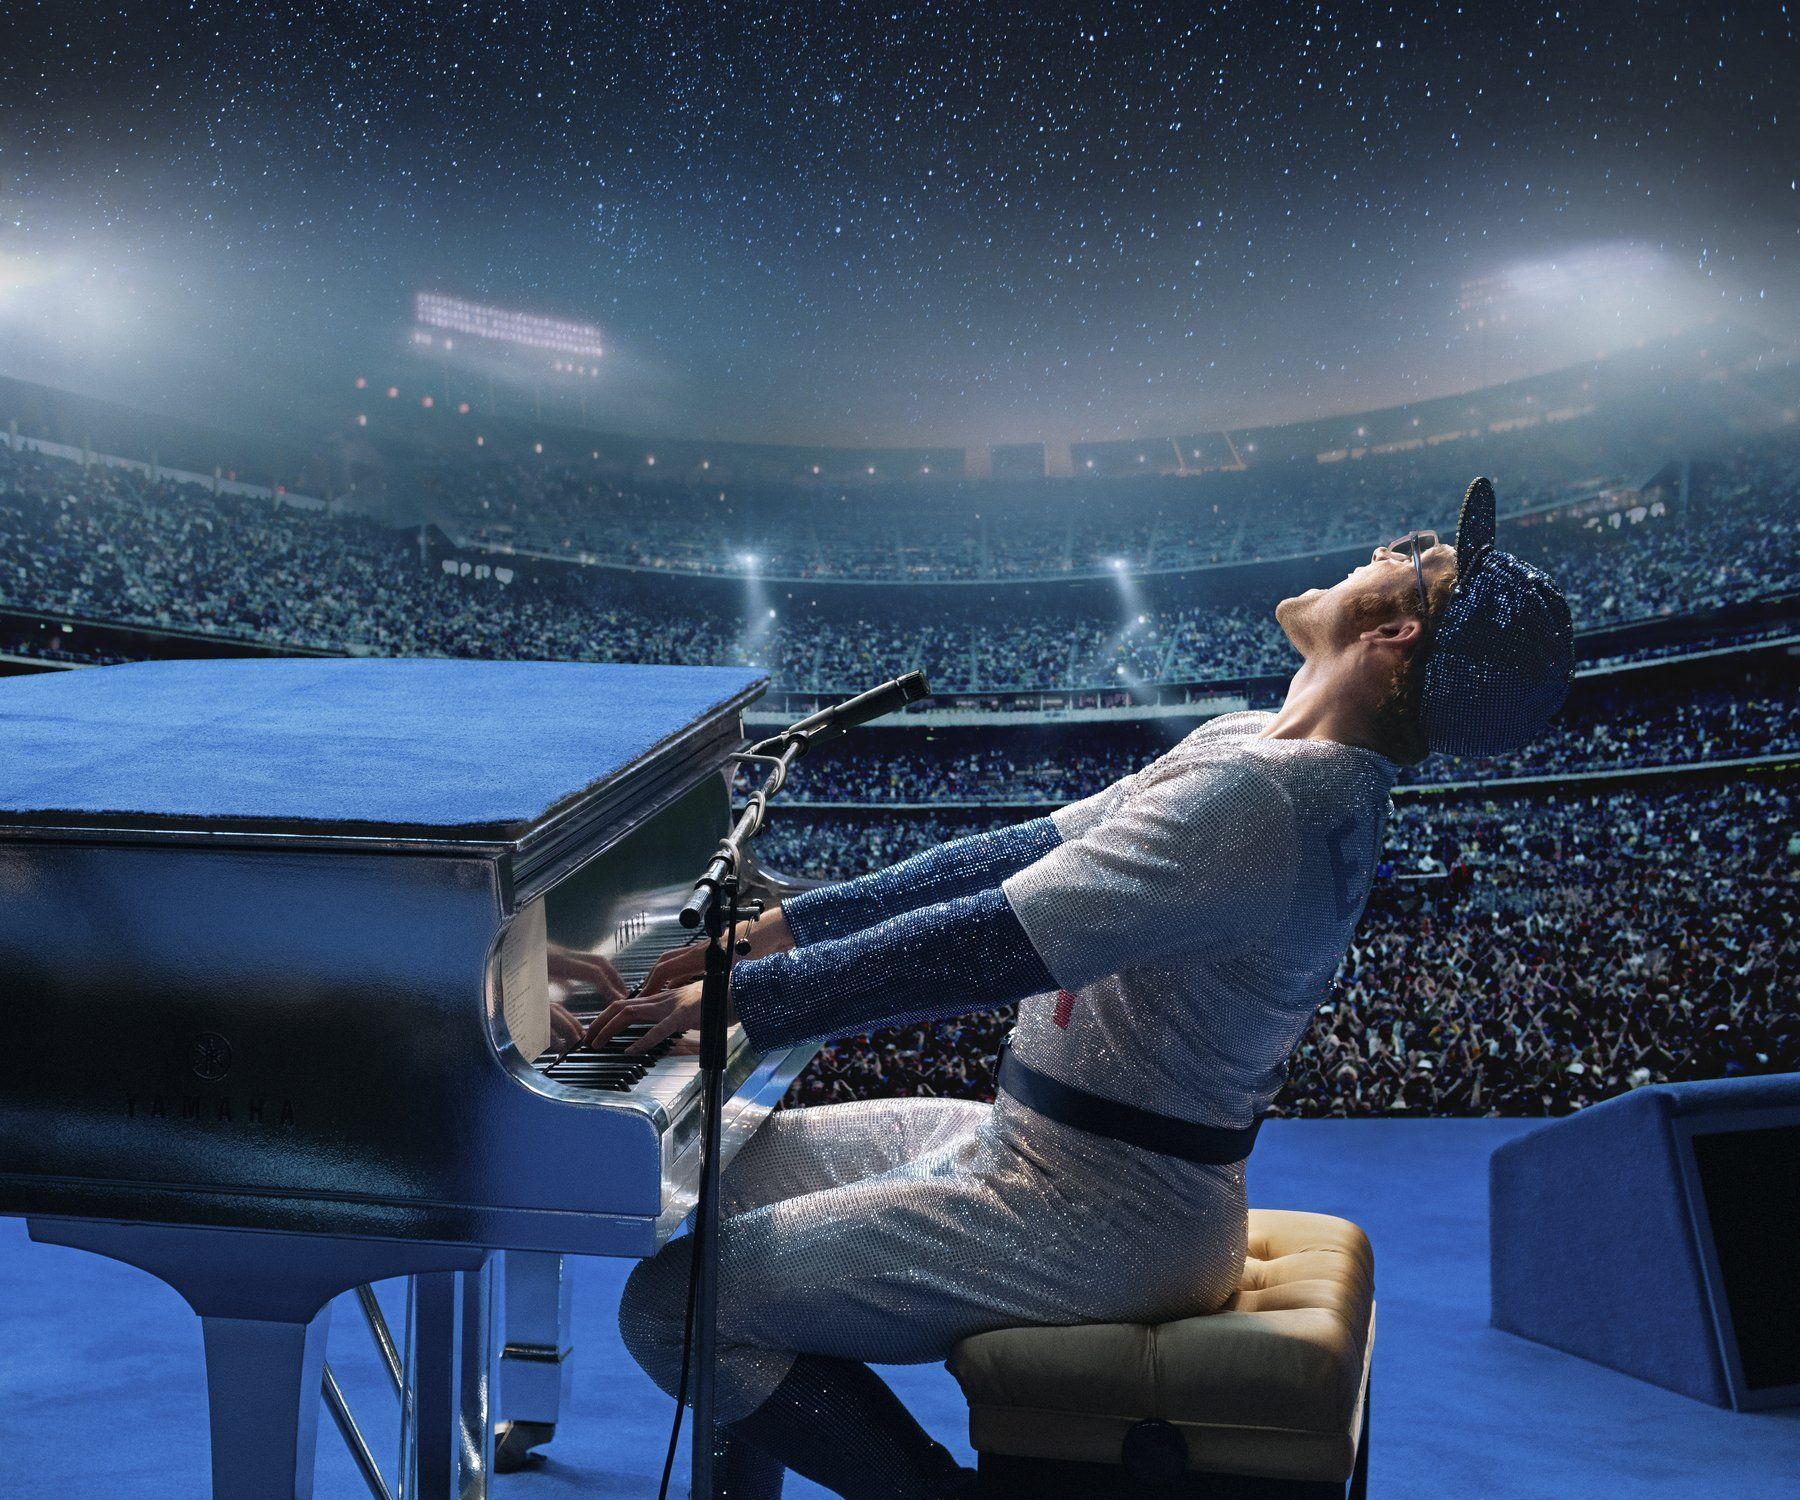 taron egerton elton john playing piano in baseball drag 2019 images